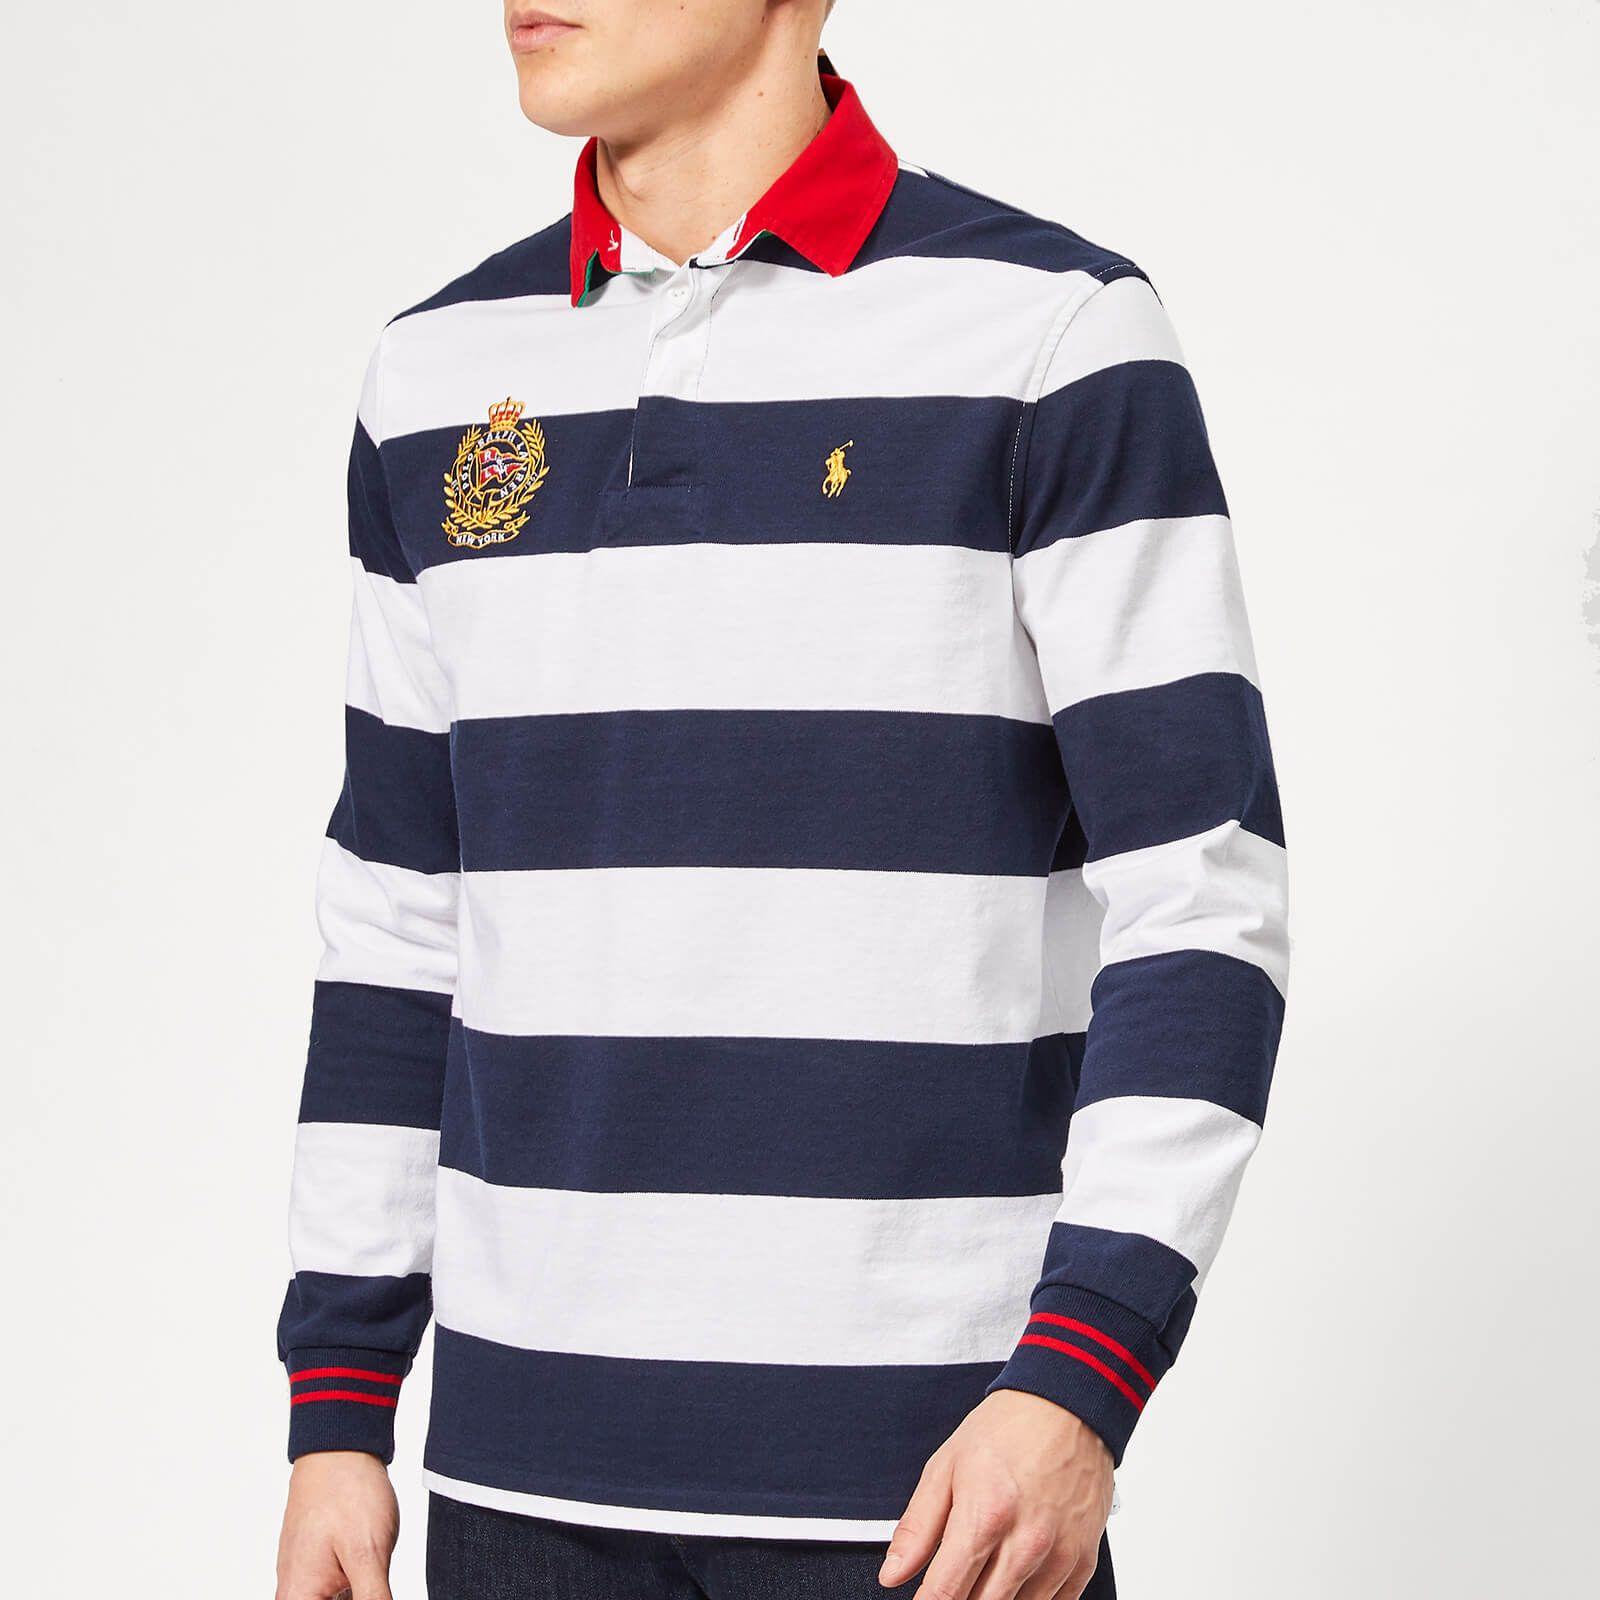 Polo Ralph Lauren Men S Newport Stripe Crest Rugby Shirt Cruise Navy White Affiliate Ad Men Newport Rugby Shirt Polo Shirt Brands Polo Ralph Lauren Mens